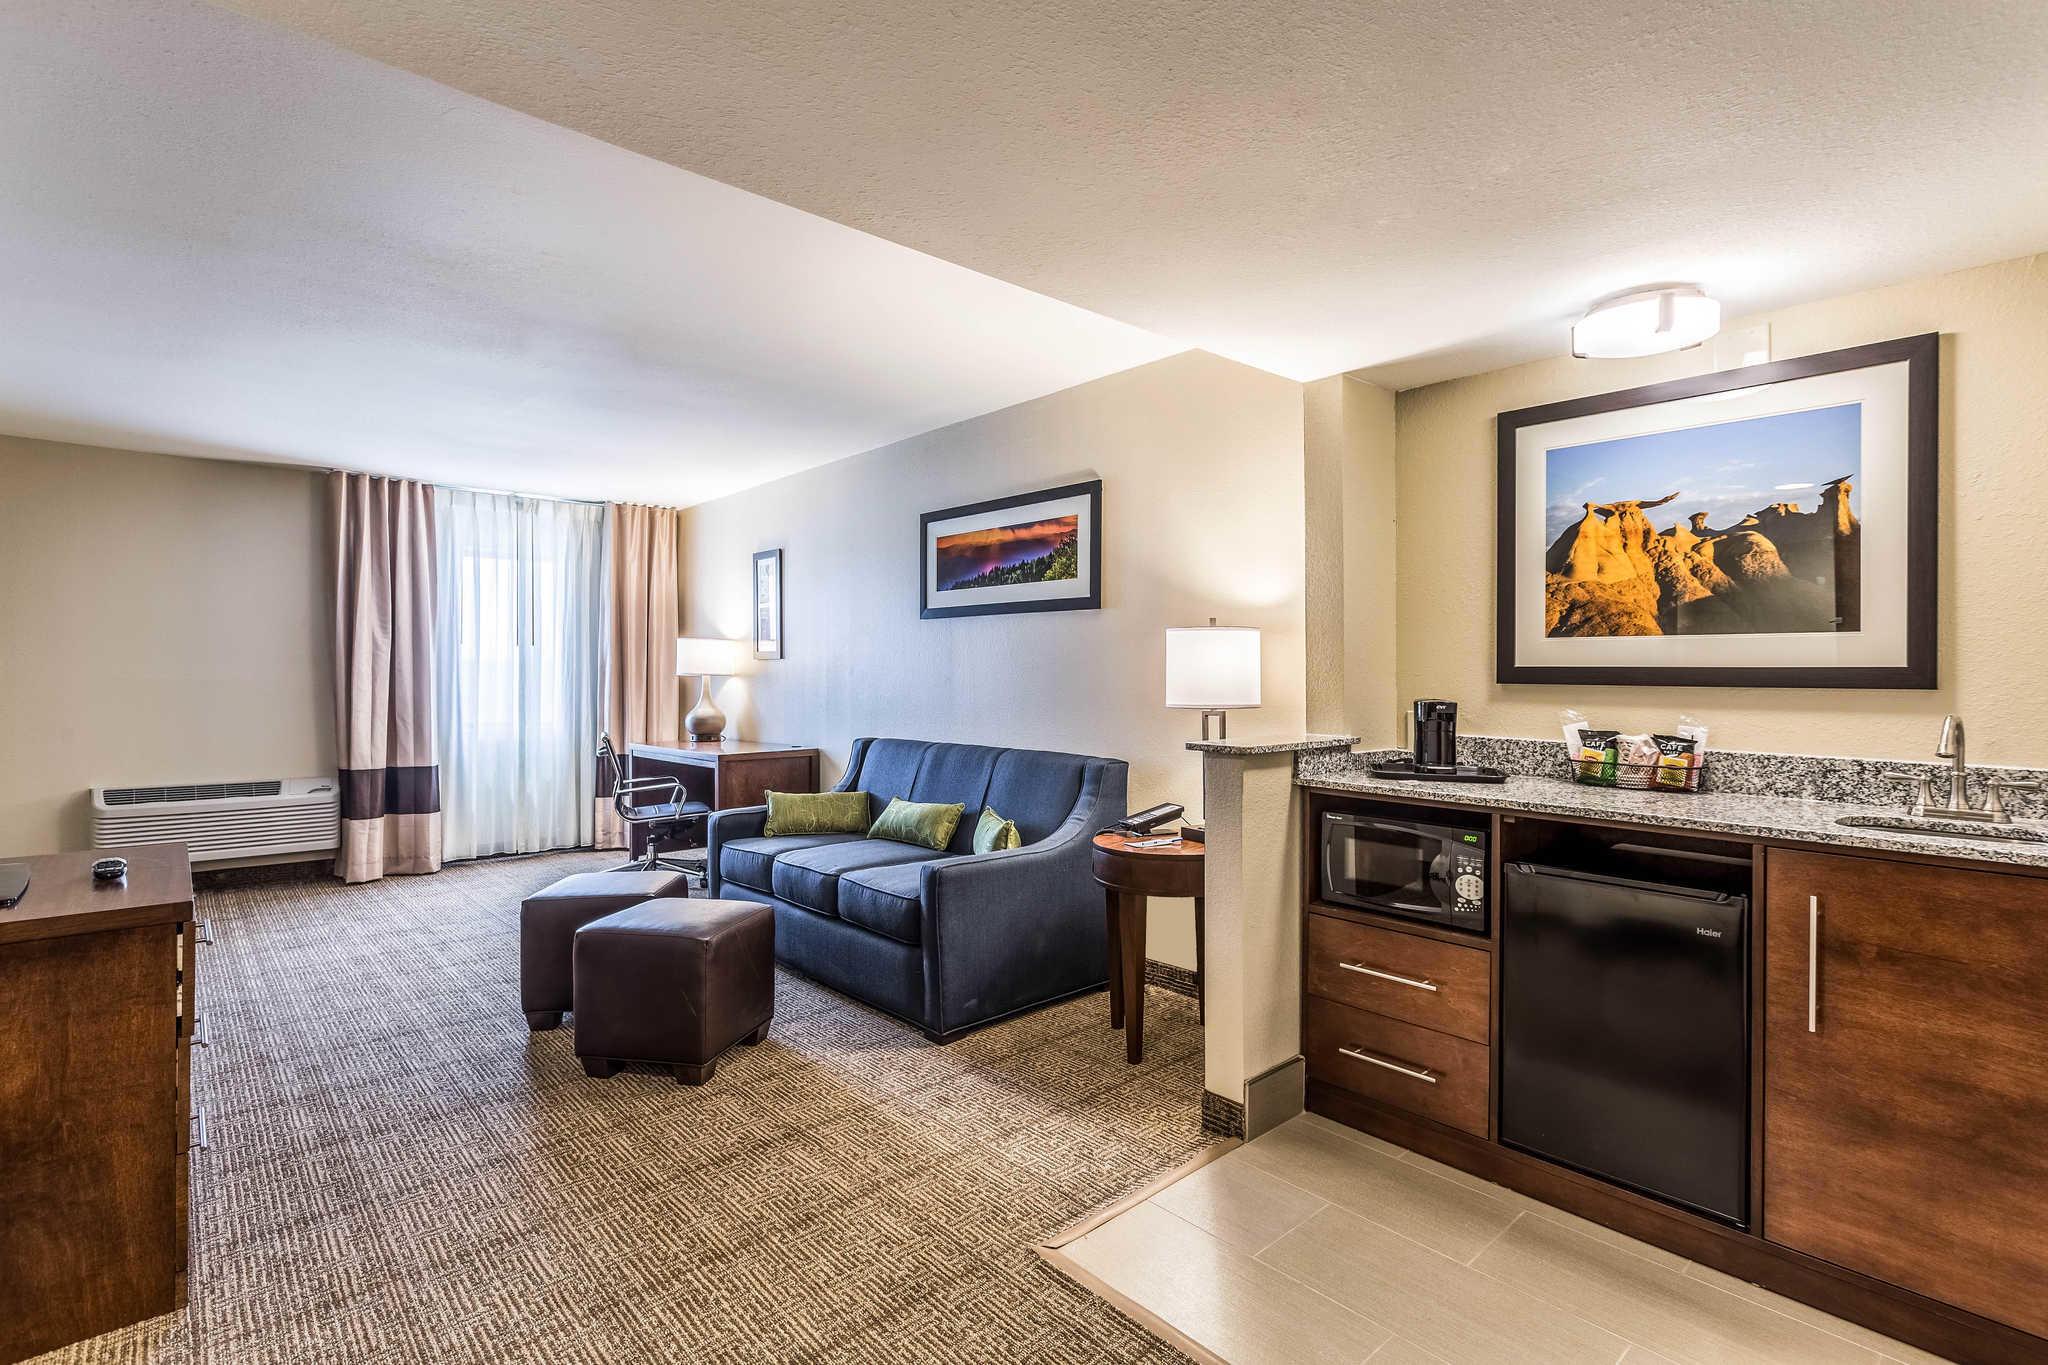 Comfort Inn & Suites Albuquerque Downtown image 19